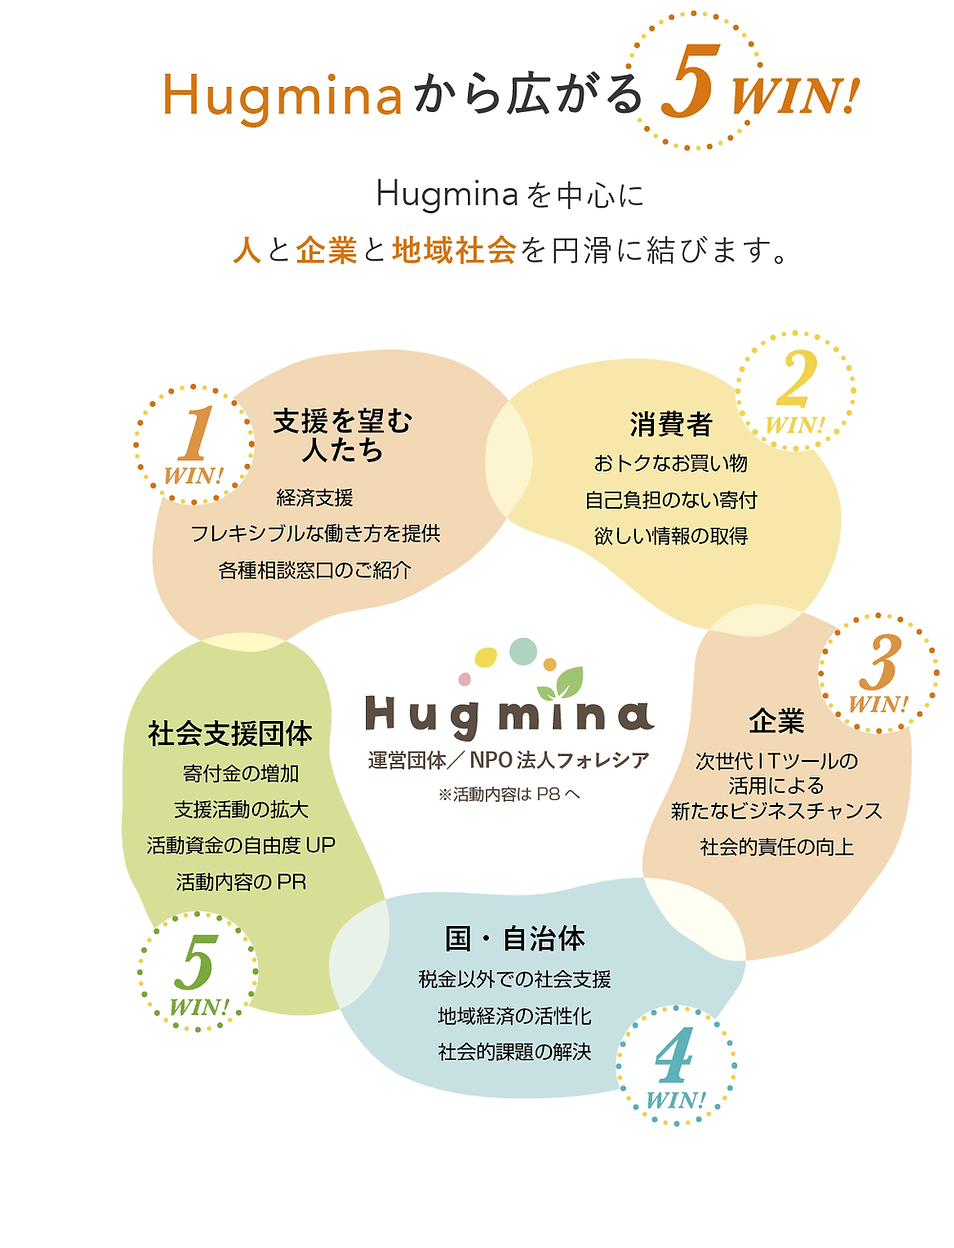 Hugmina_tool_web-02-min.png